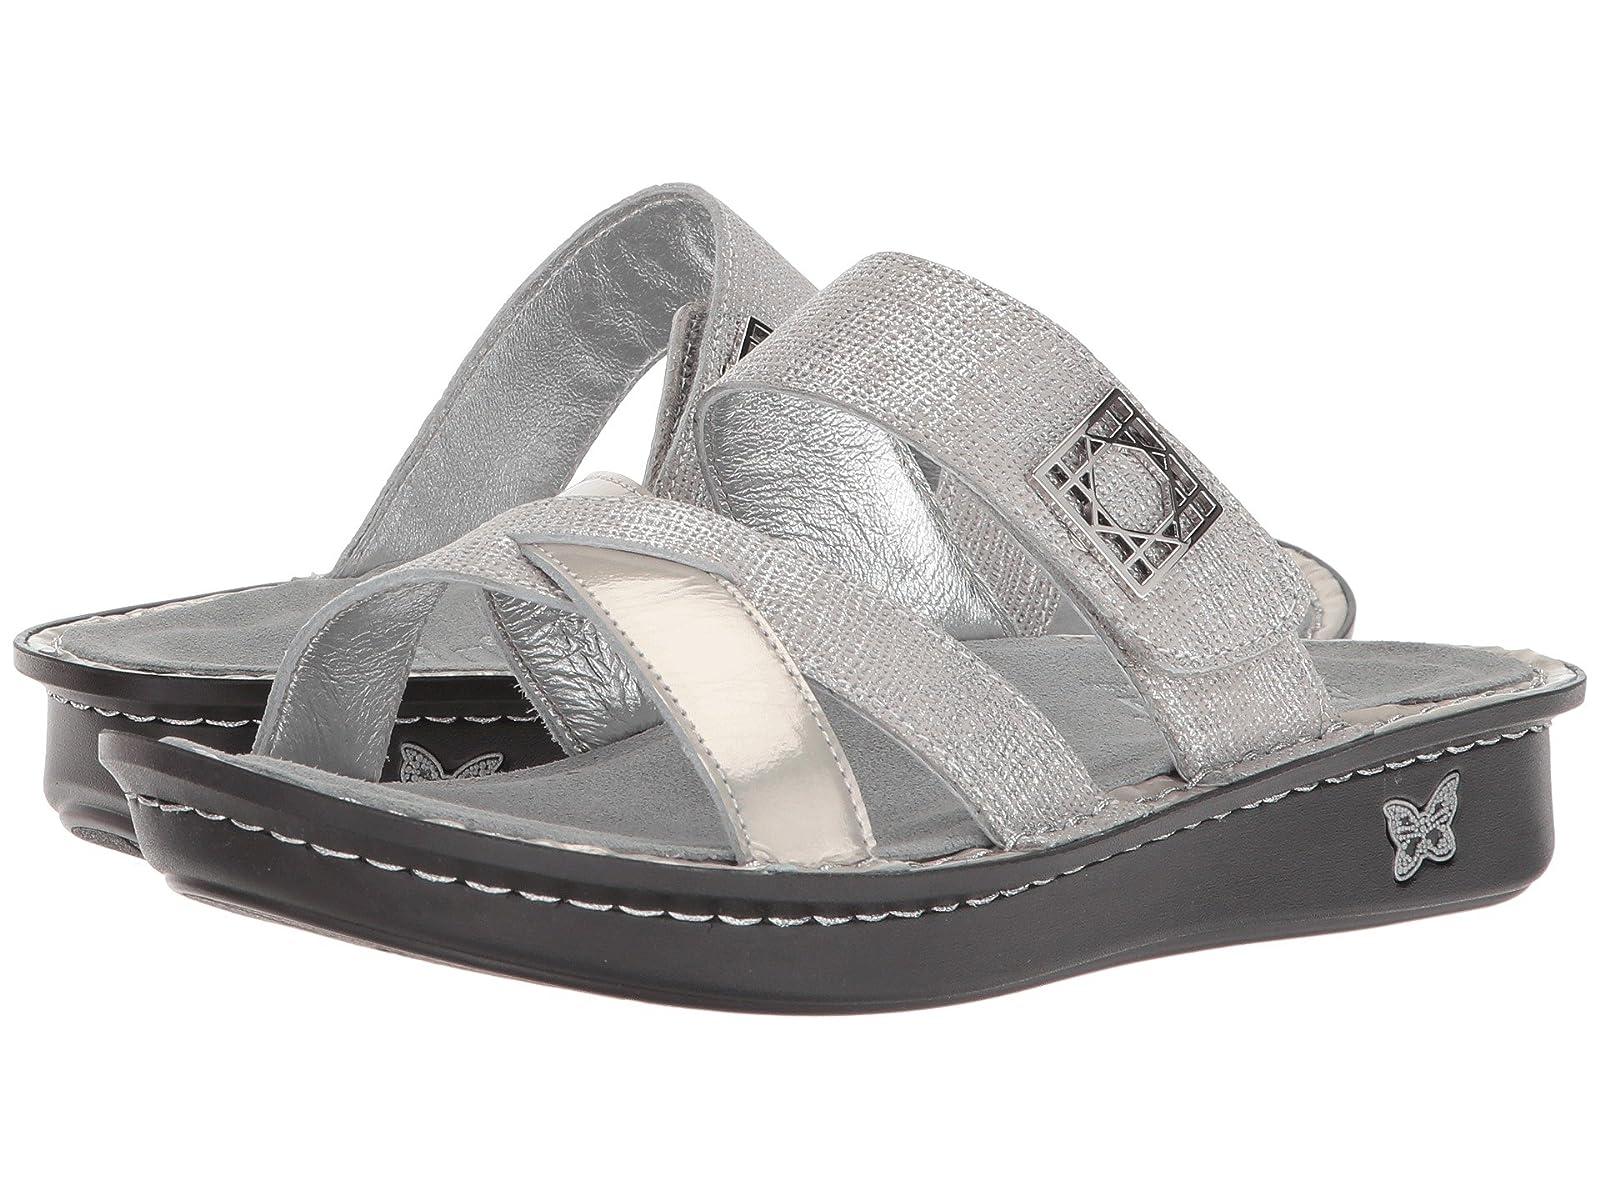 Alegria VictoriahAtmospheric grades have affordable shoes